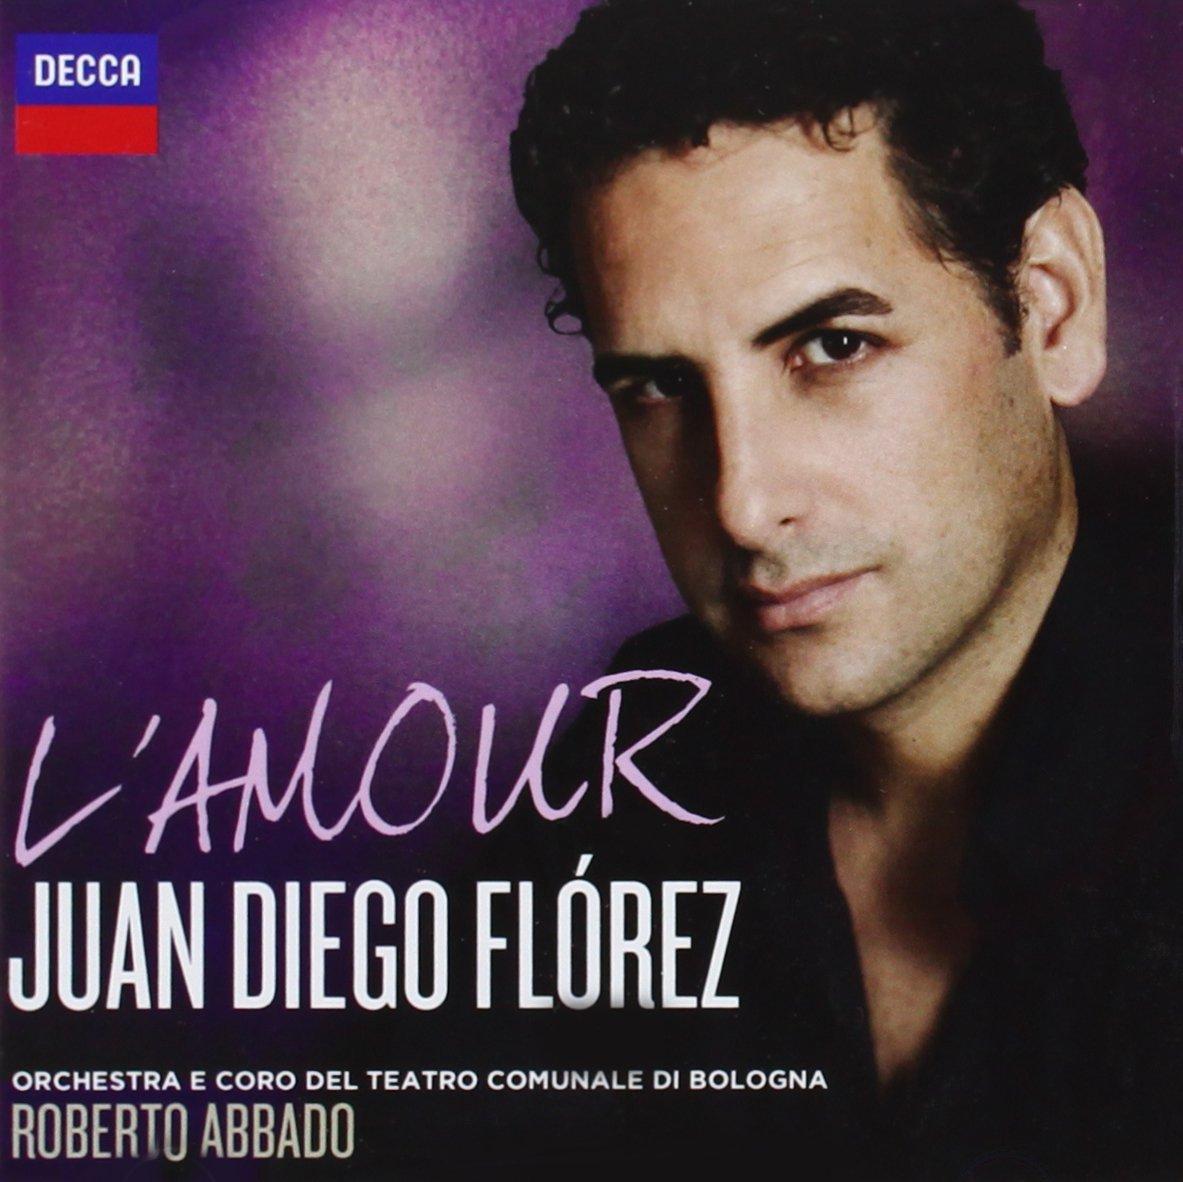 https://www.freundederkuenste.de/uploads/pics/Juan_Diego_Florez-Album.jpg